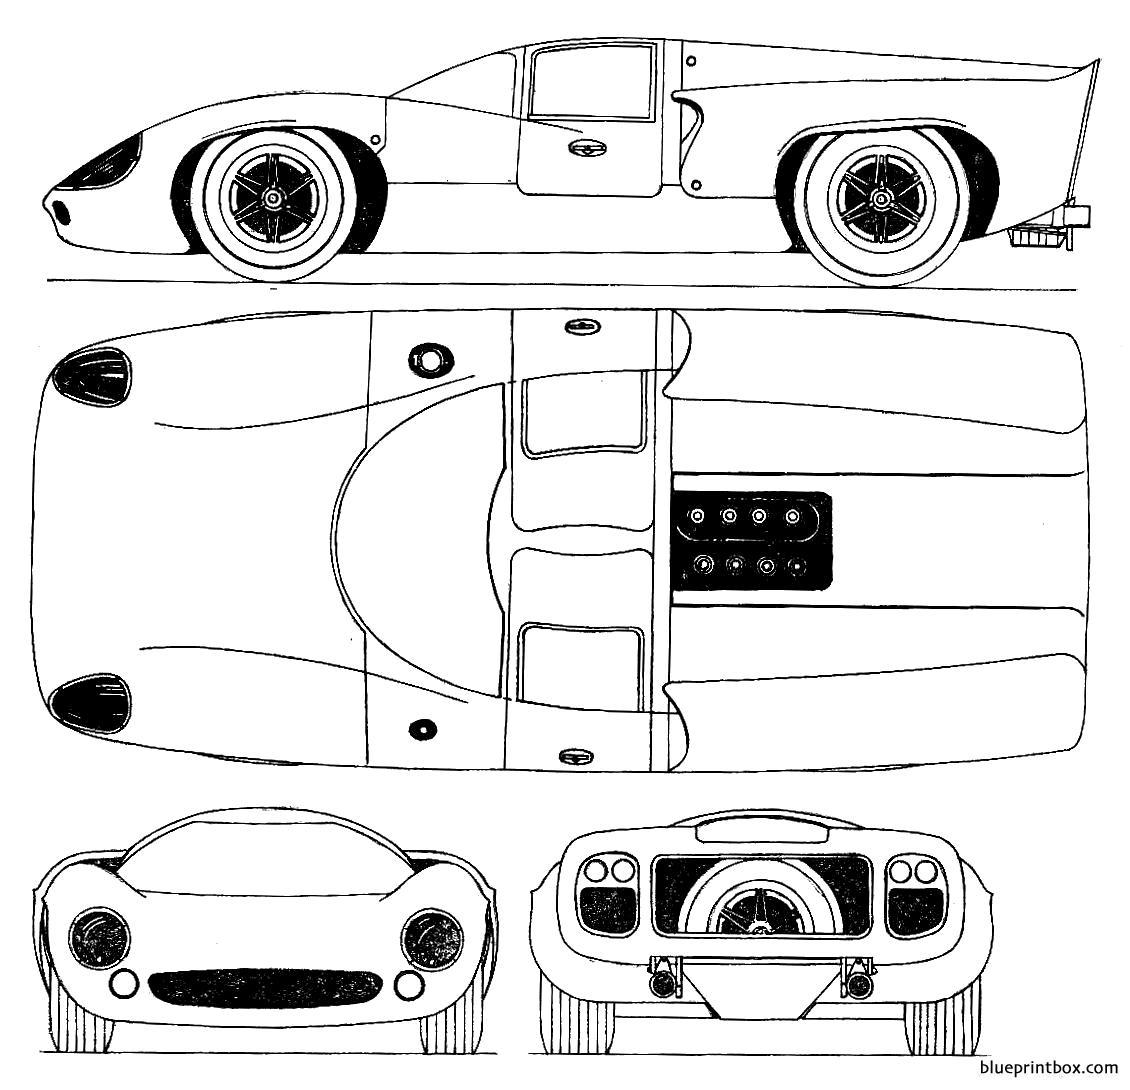 Lola T70 Mkiii 1969 Can Am - Blueprintbox Com